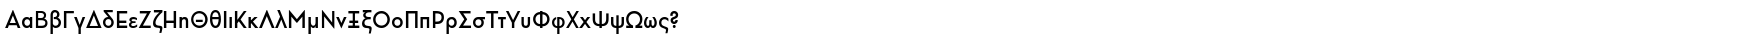 hgfmd__-webfont.ttf